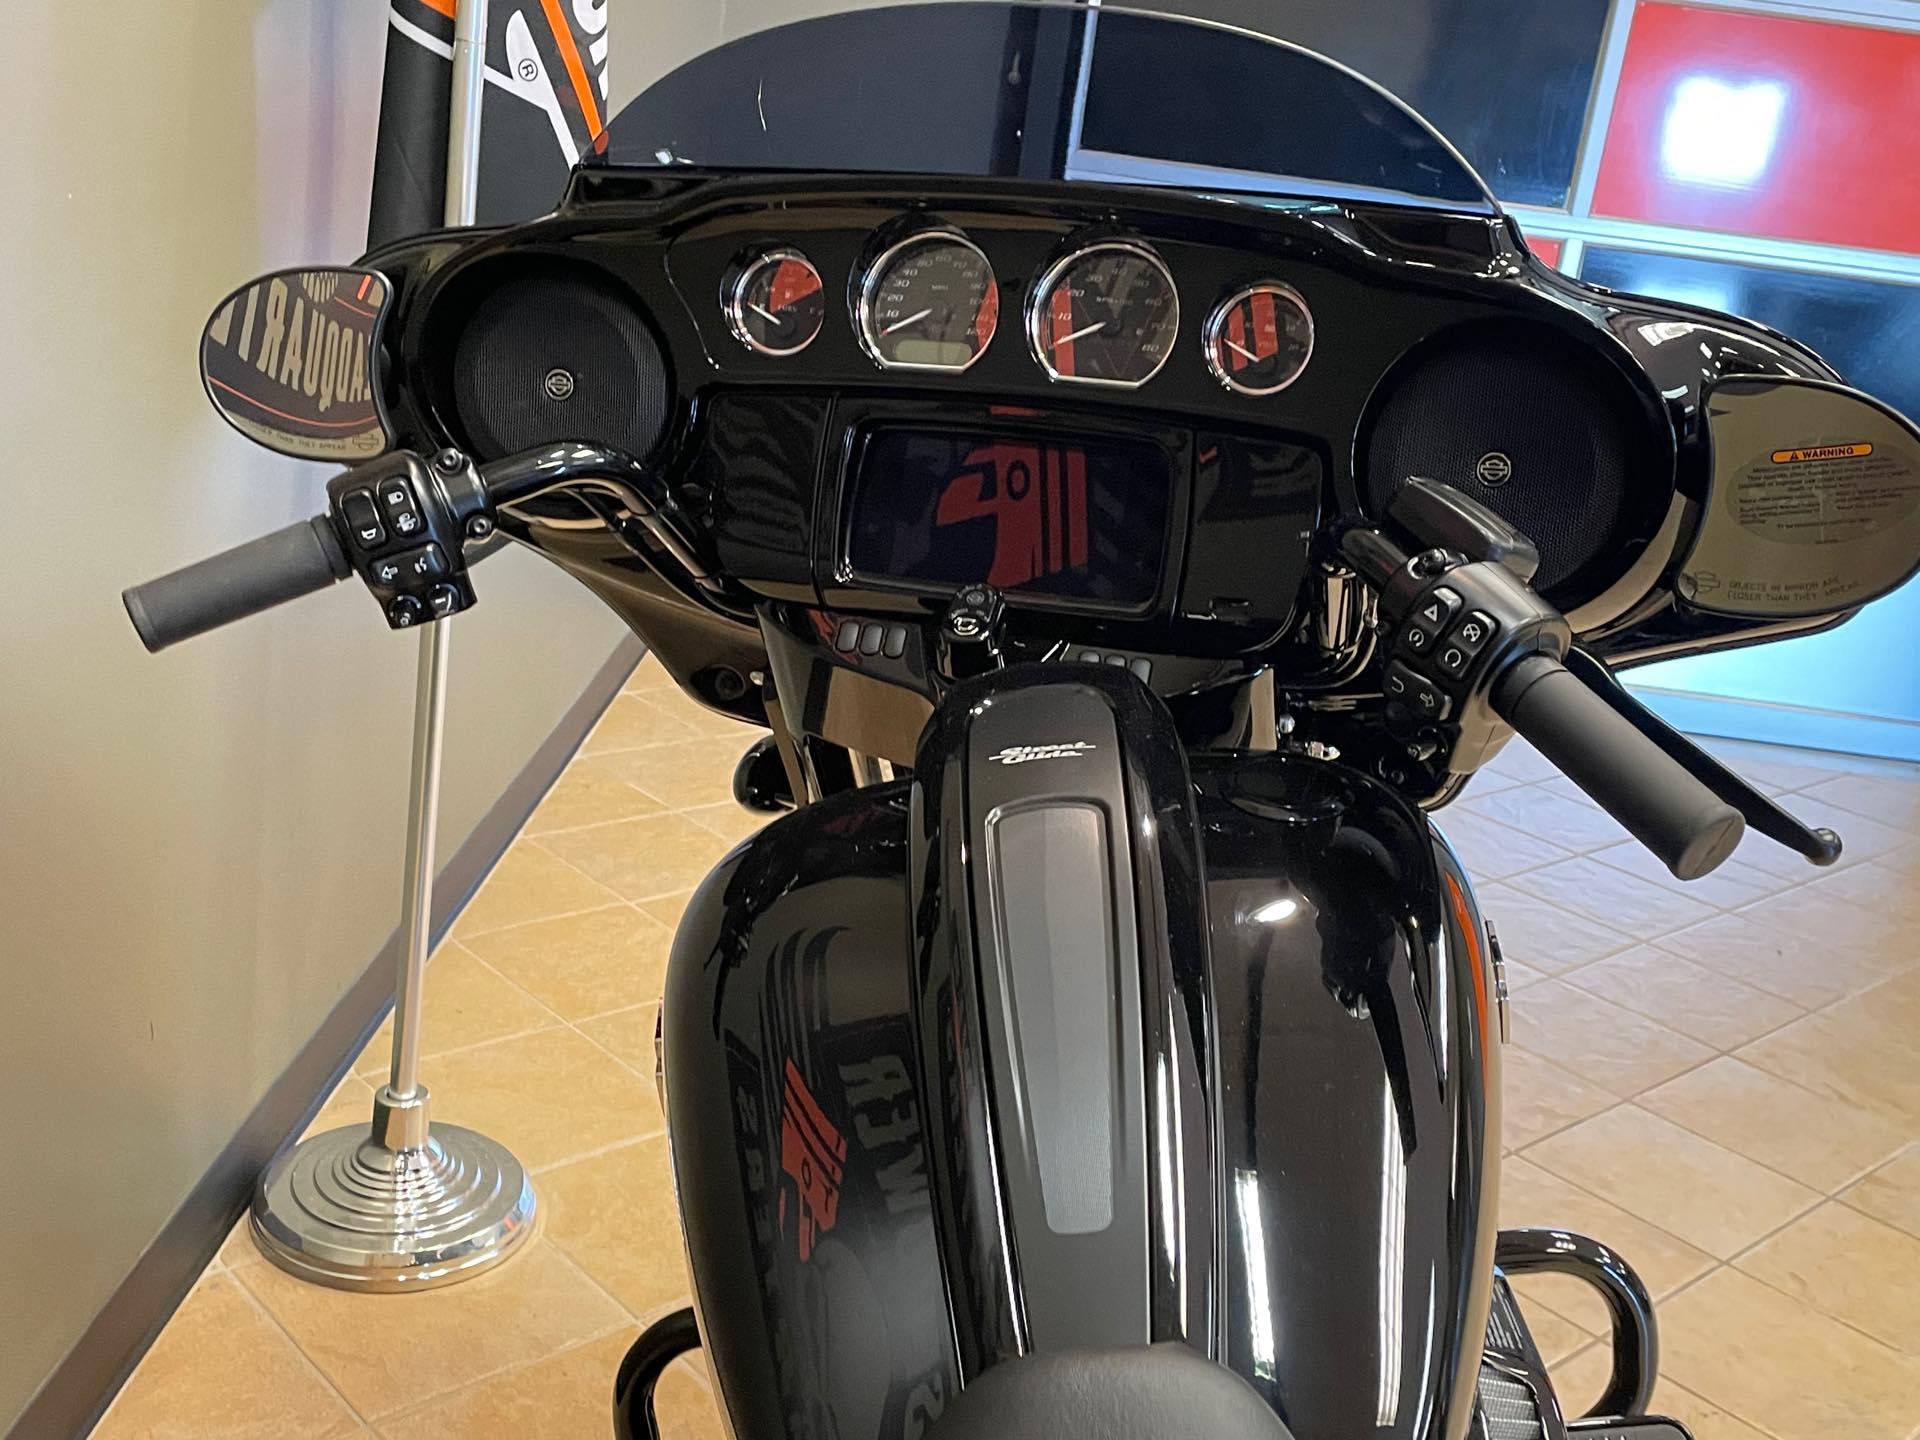 2021 Harley-Davidson Grand American Touring Street Glide Special at Loess Hills Harley-Davidson